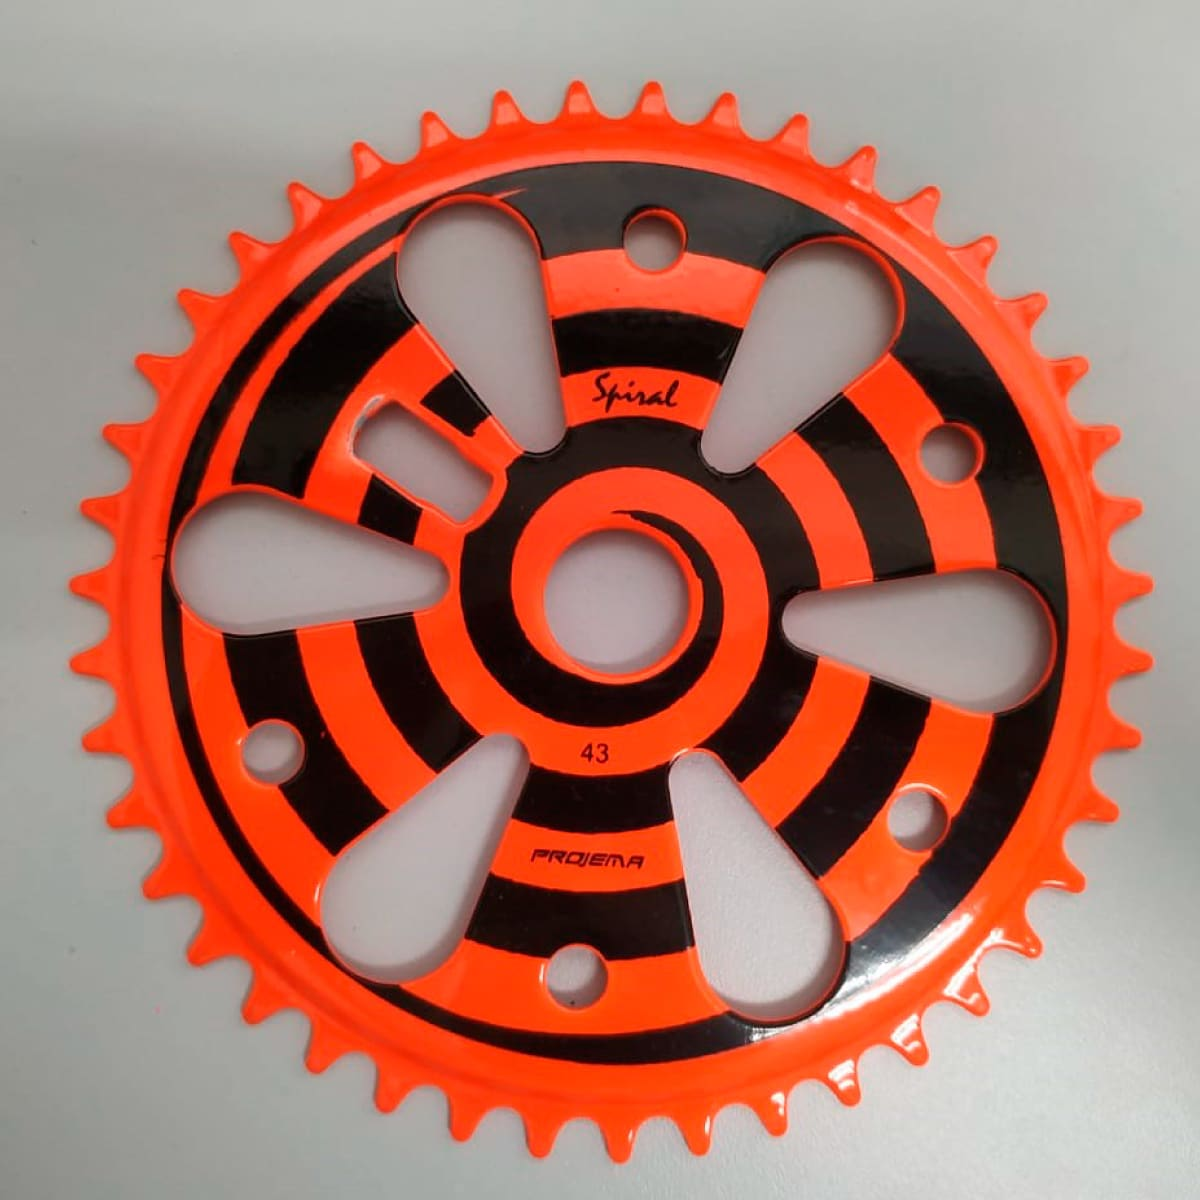 Coroa Projema 43D Spiral Laranja Neon